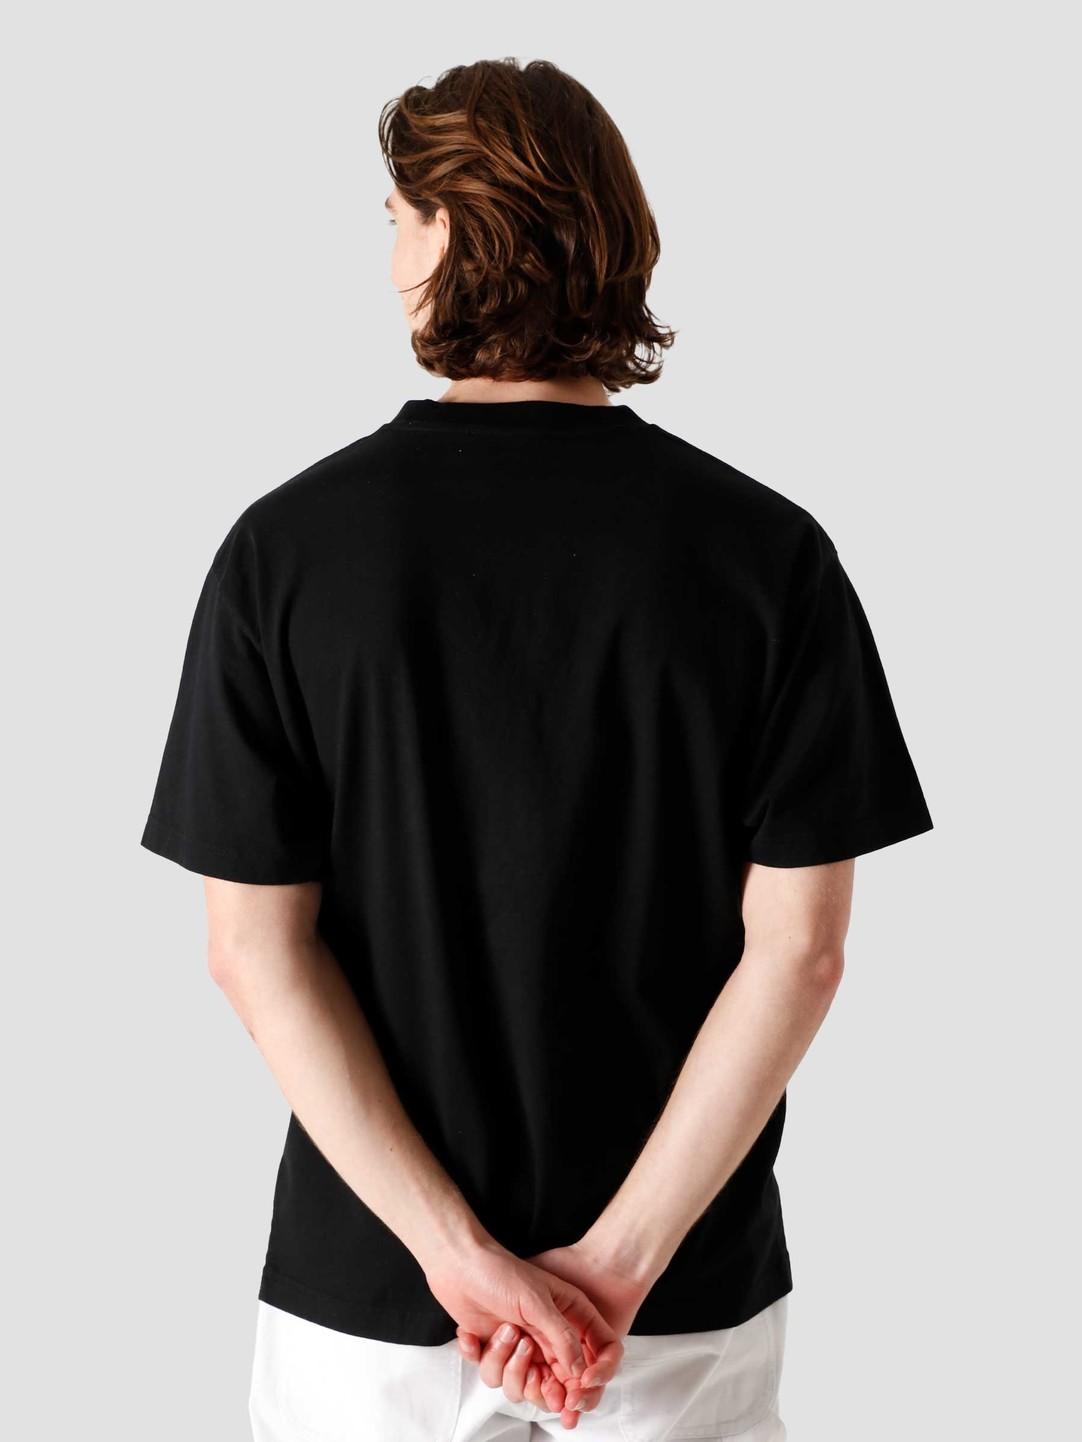 Olaf Hussein Olaf Hussein OH Block T-Shirt Black